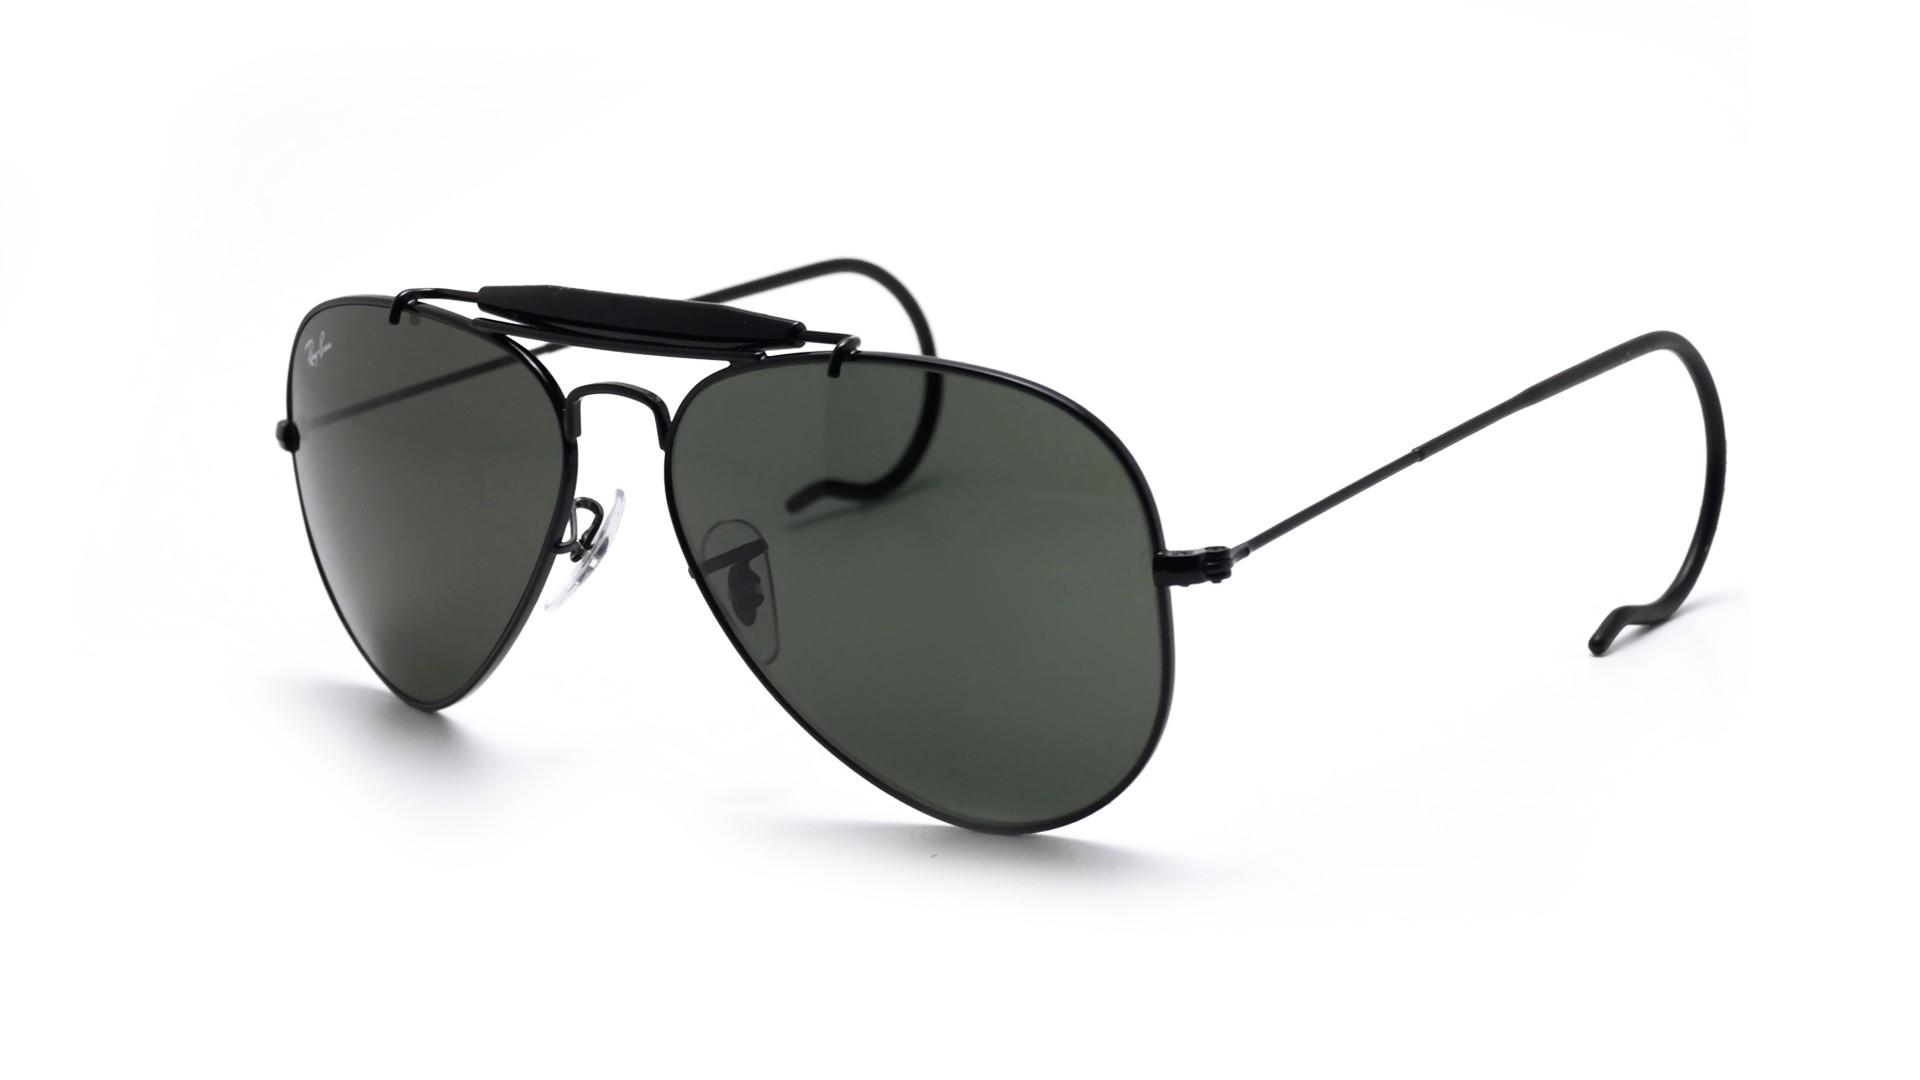 b0c5d0cef5 Sunglasses Ray-Ban Outdoorsman Black G-15 RB3030 L9500 58-14 Large